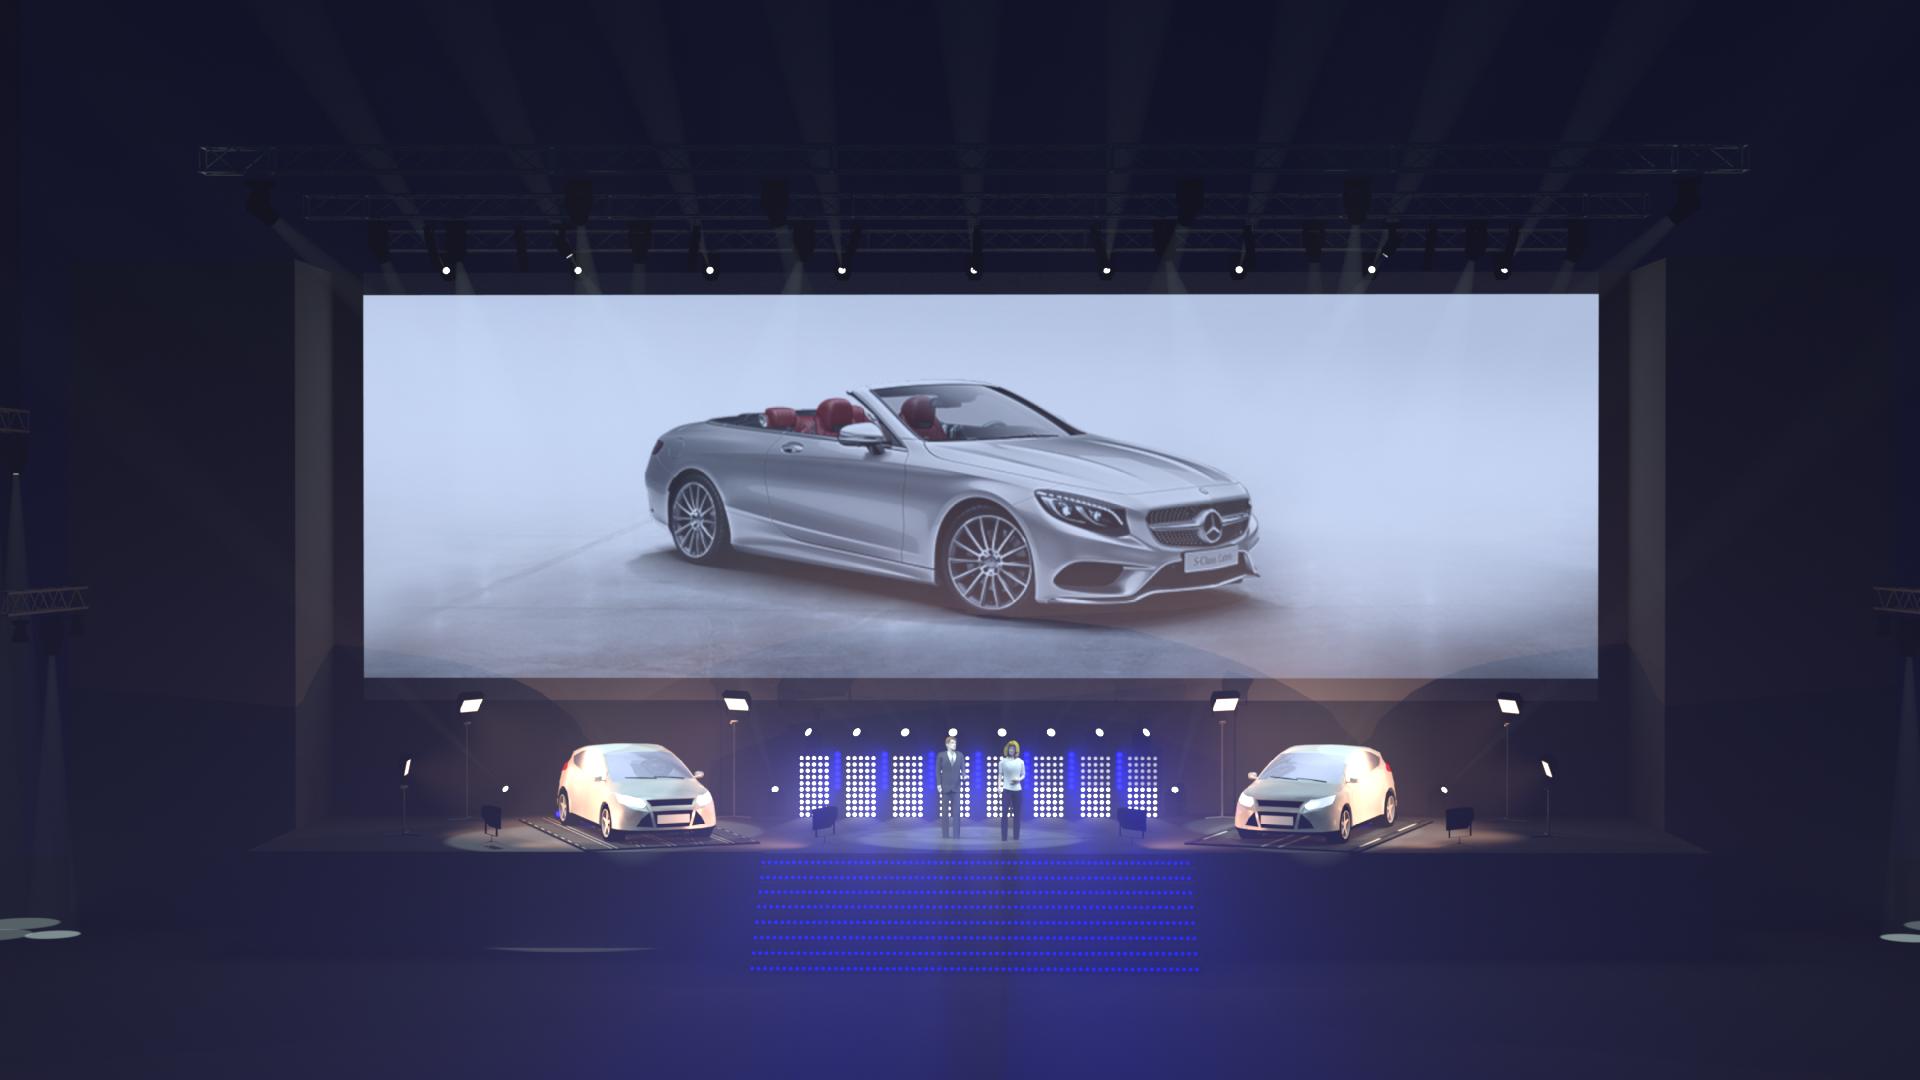 Mercedes_CCW_render FULL blu.png